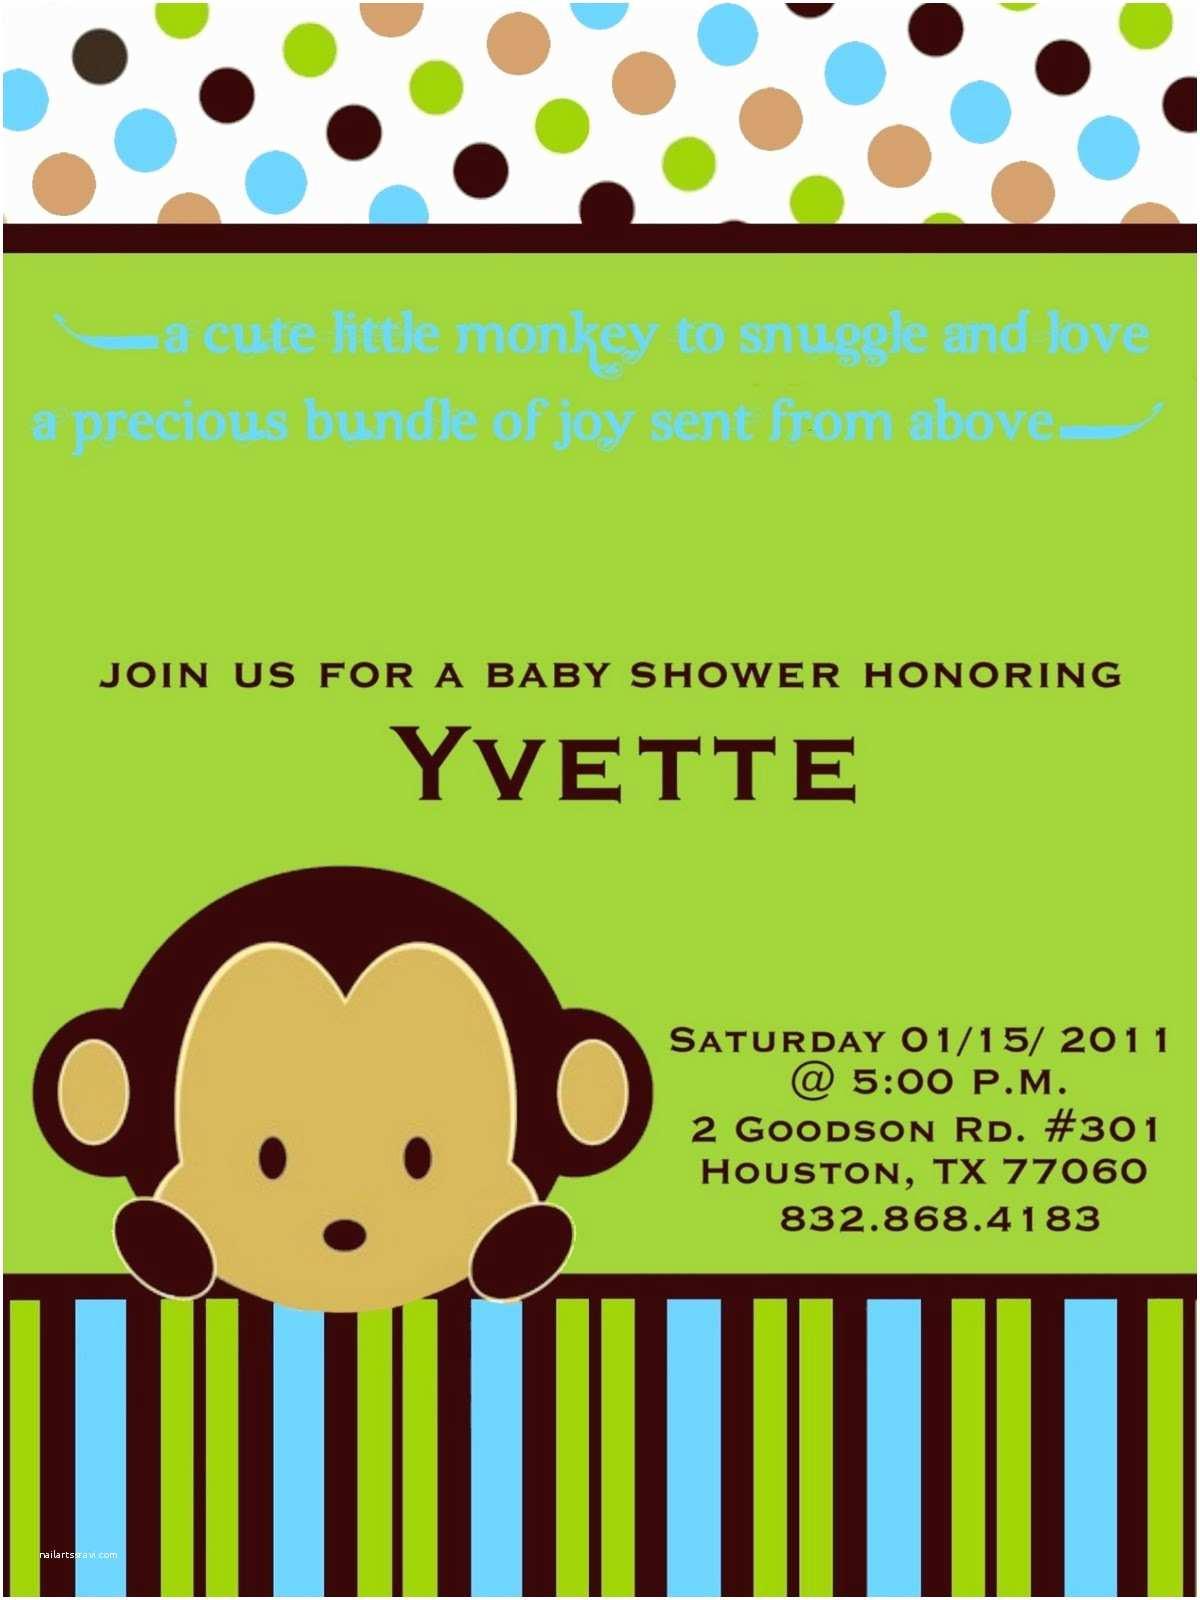 Target Baby Shower Invitations Tar Baby Shower Registry Image